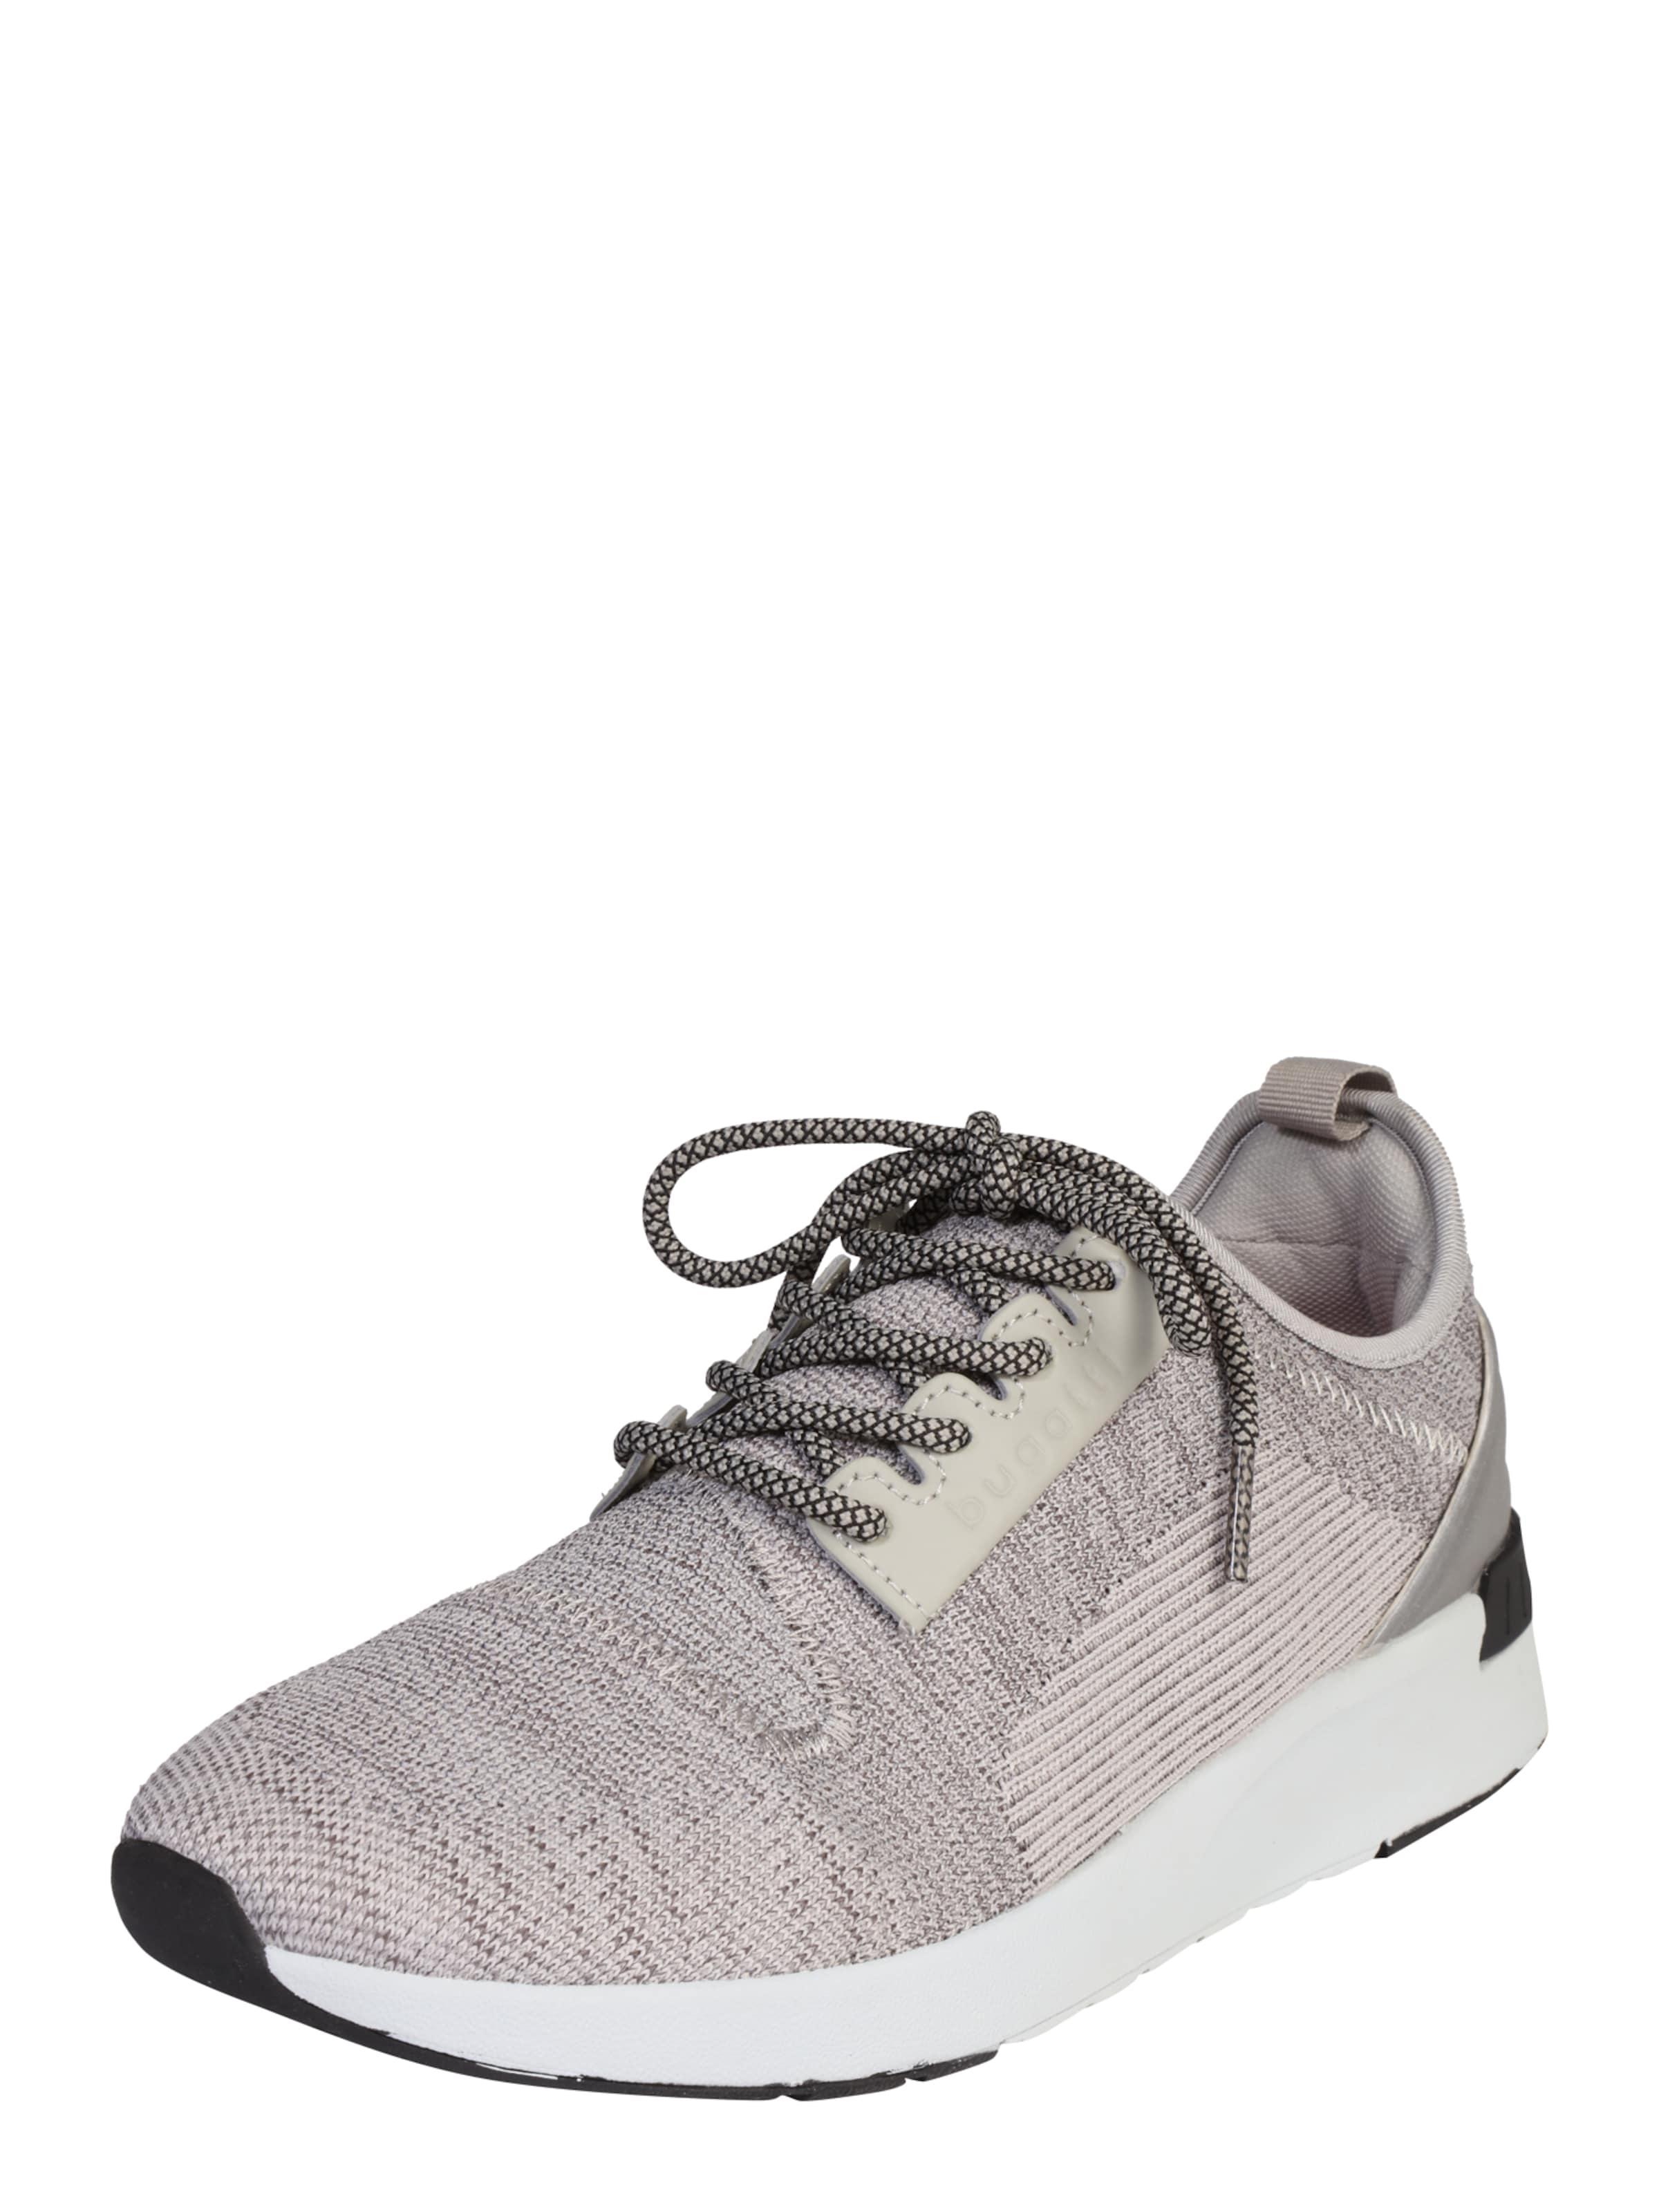 Haltbare Mode billige Schuhe bugatti | 'Sneaker im Melange-Design' Schuhe Gut getragene Schuhe